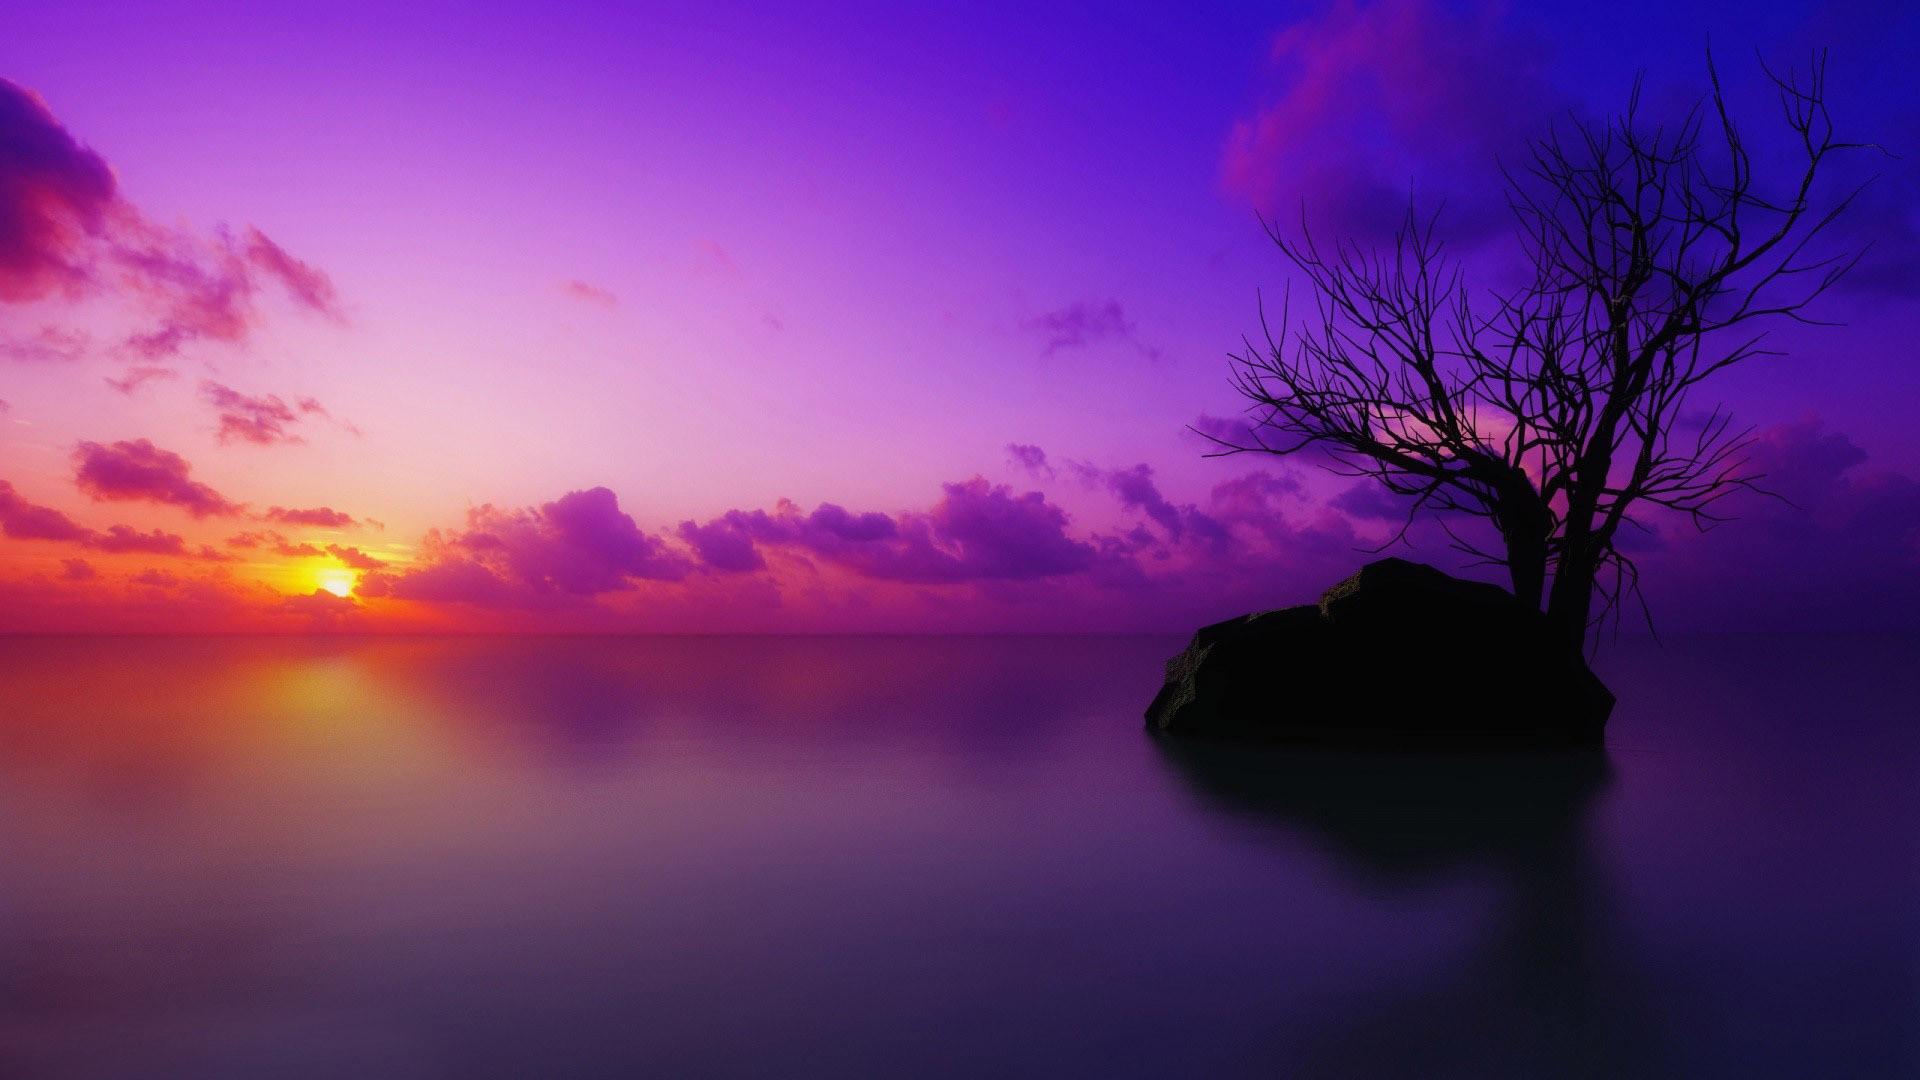 Purple sunset wallpaper – 805912